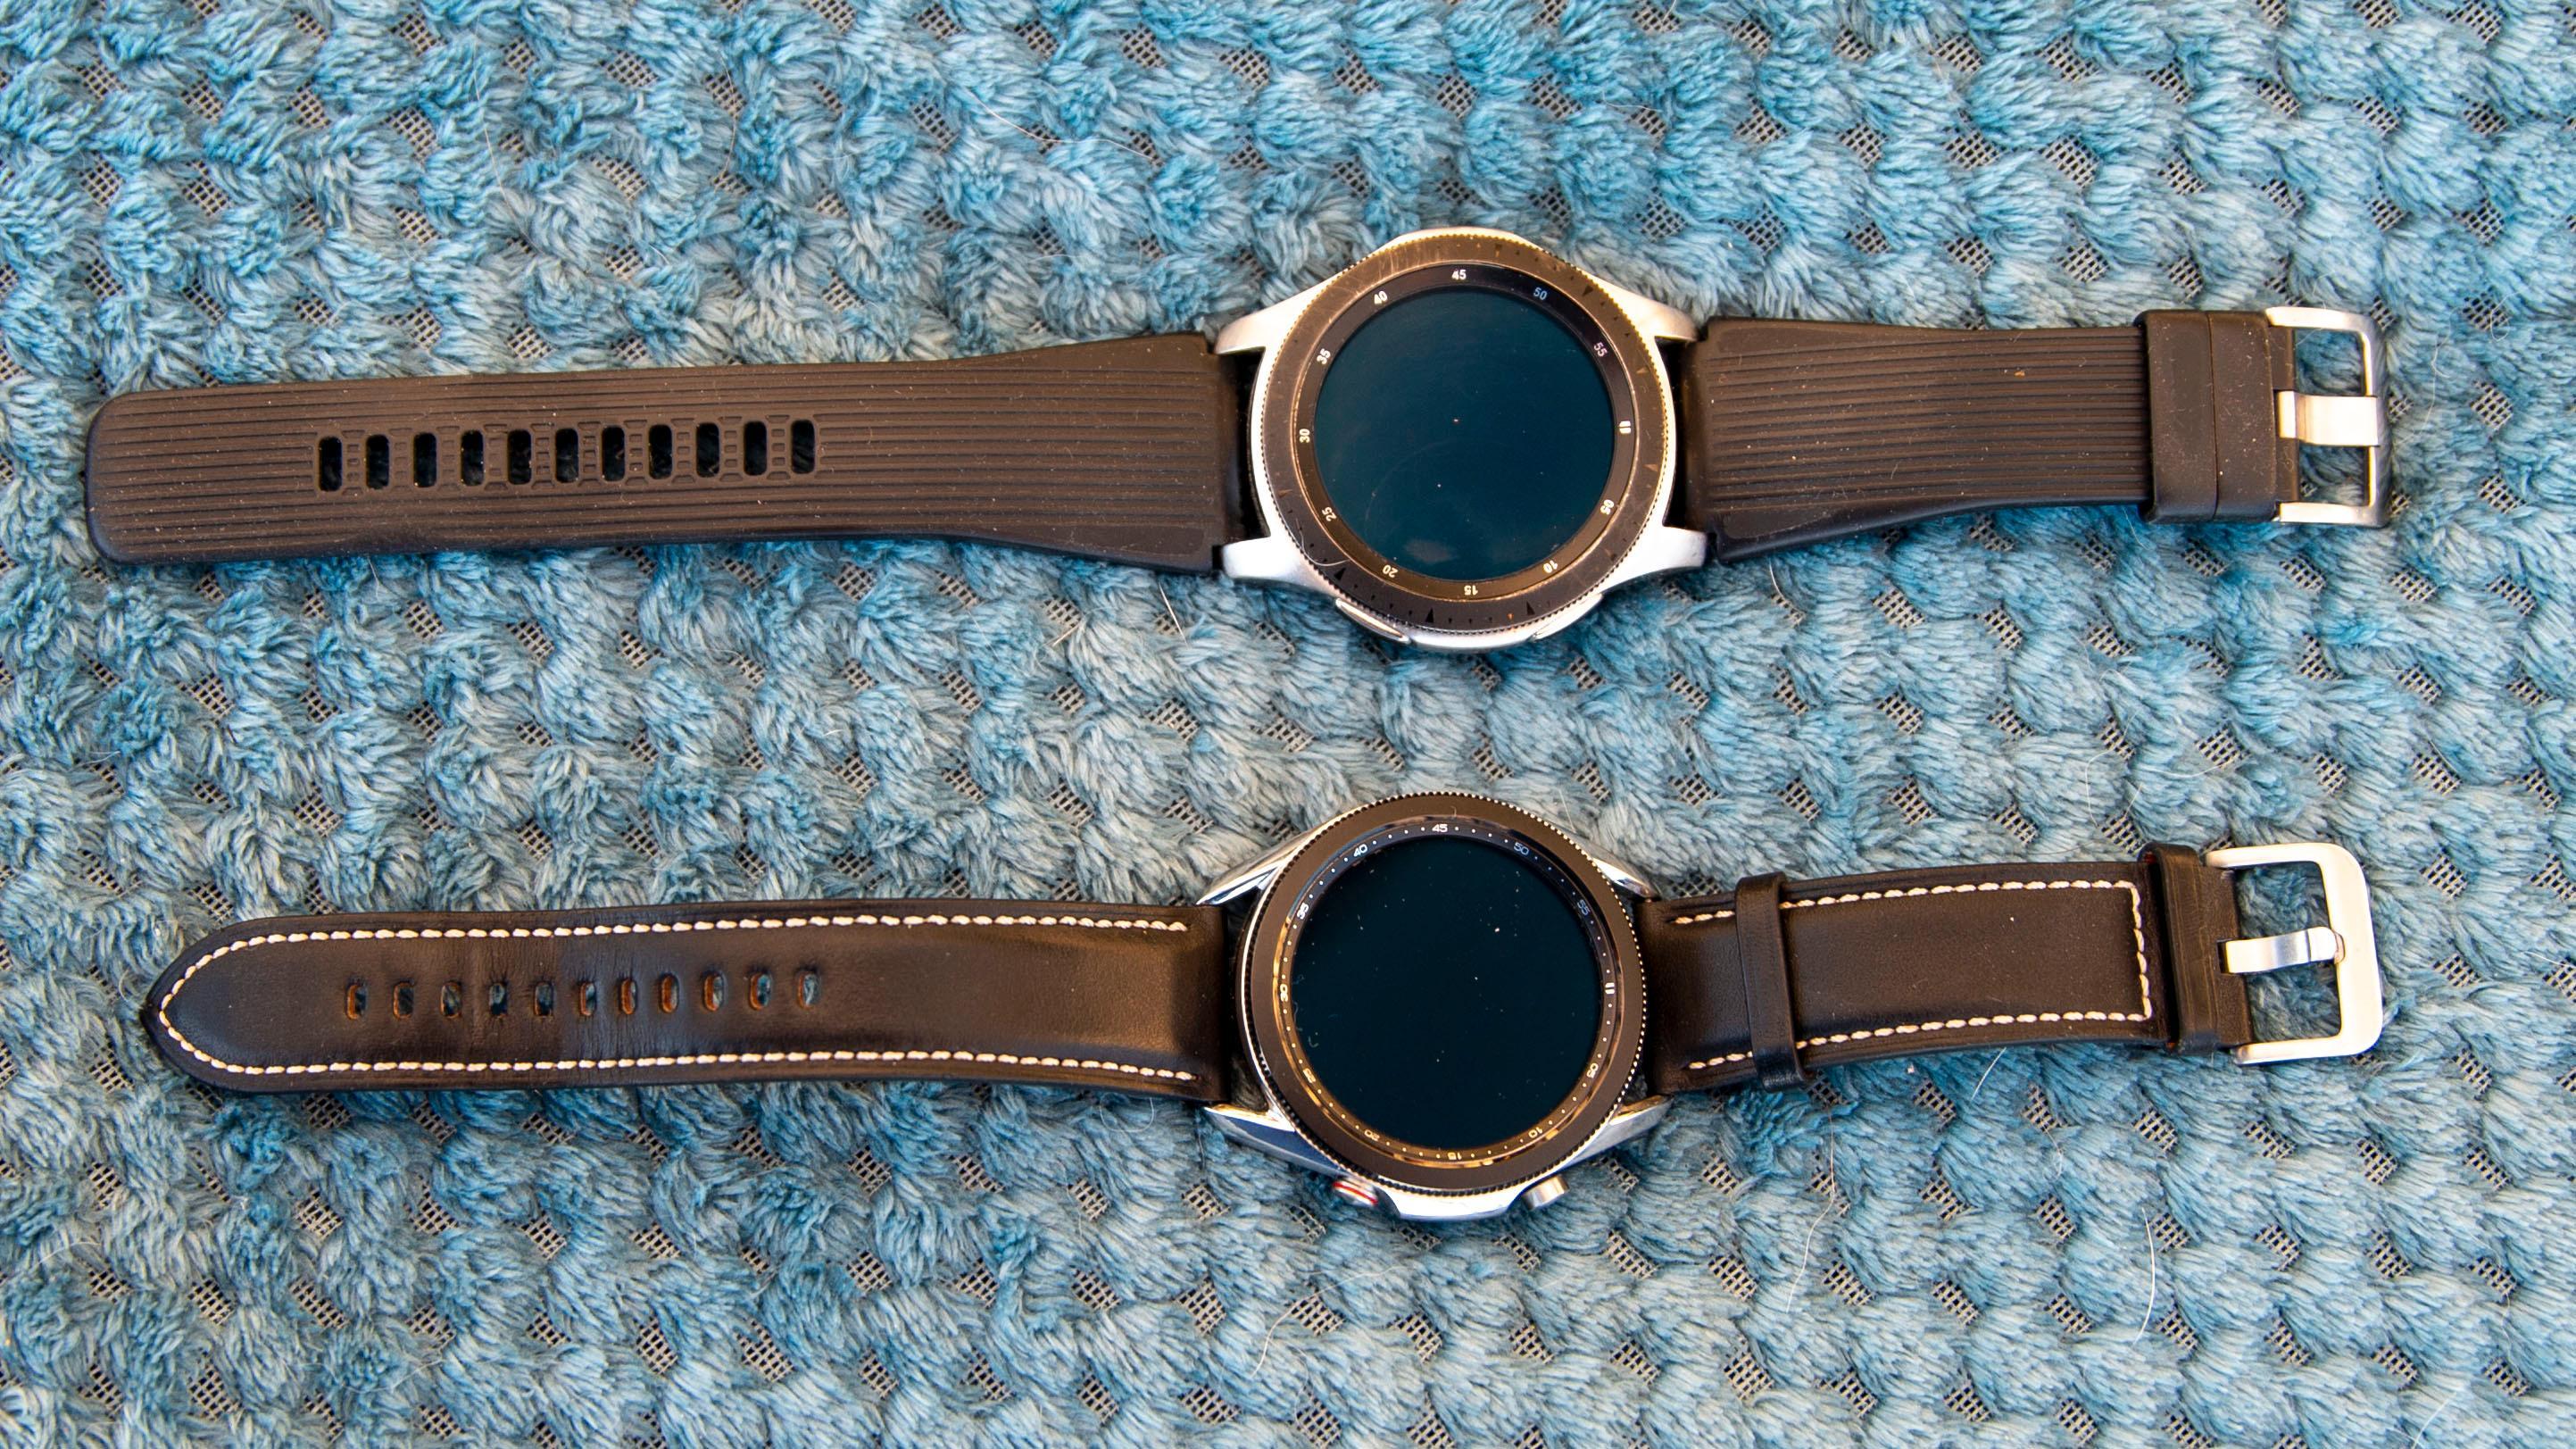 Her der du Galaxy Watch (øverst) og Galaxy Watch 3